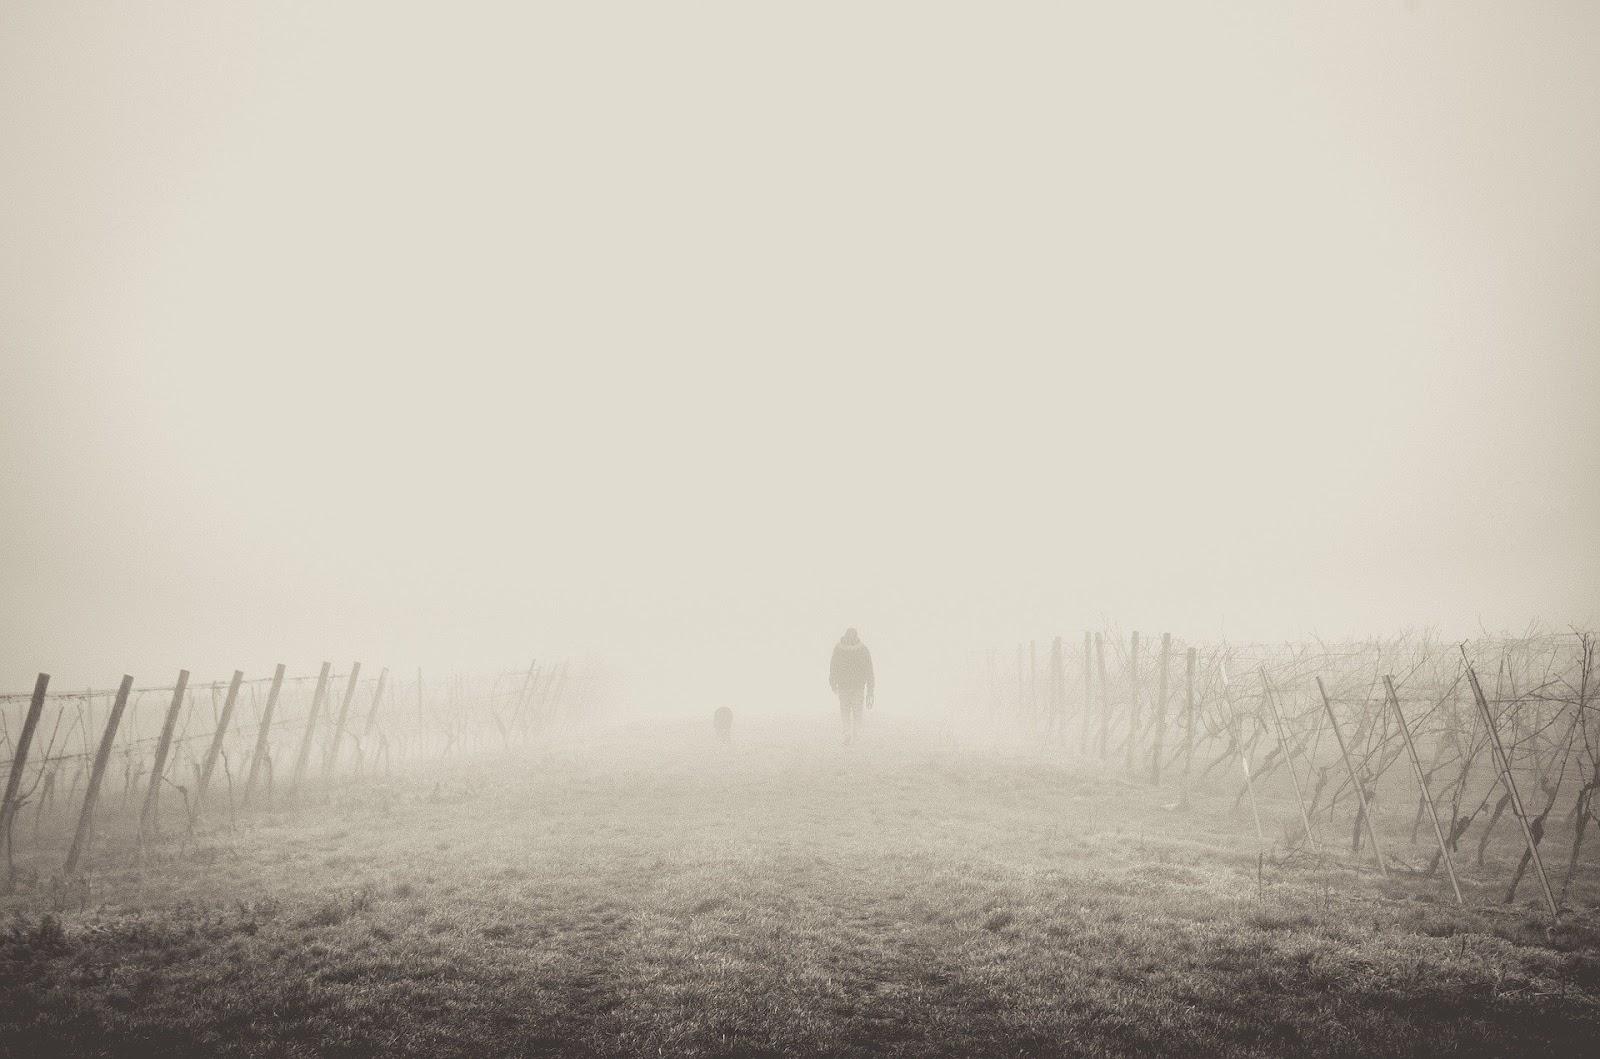 fog-1209205_1920.jpg